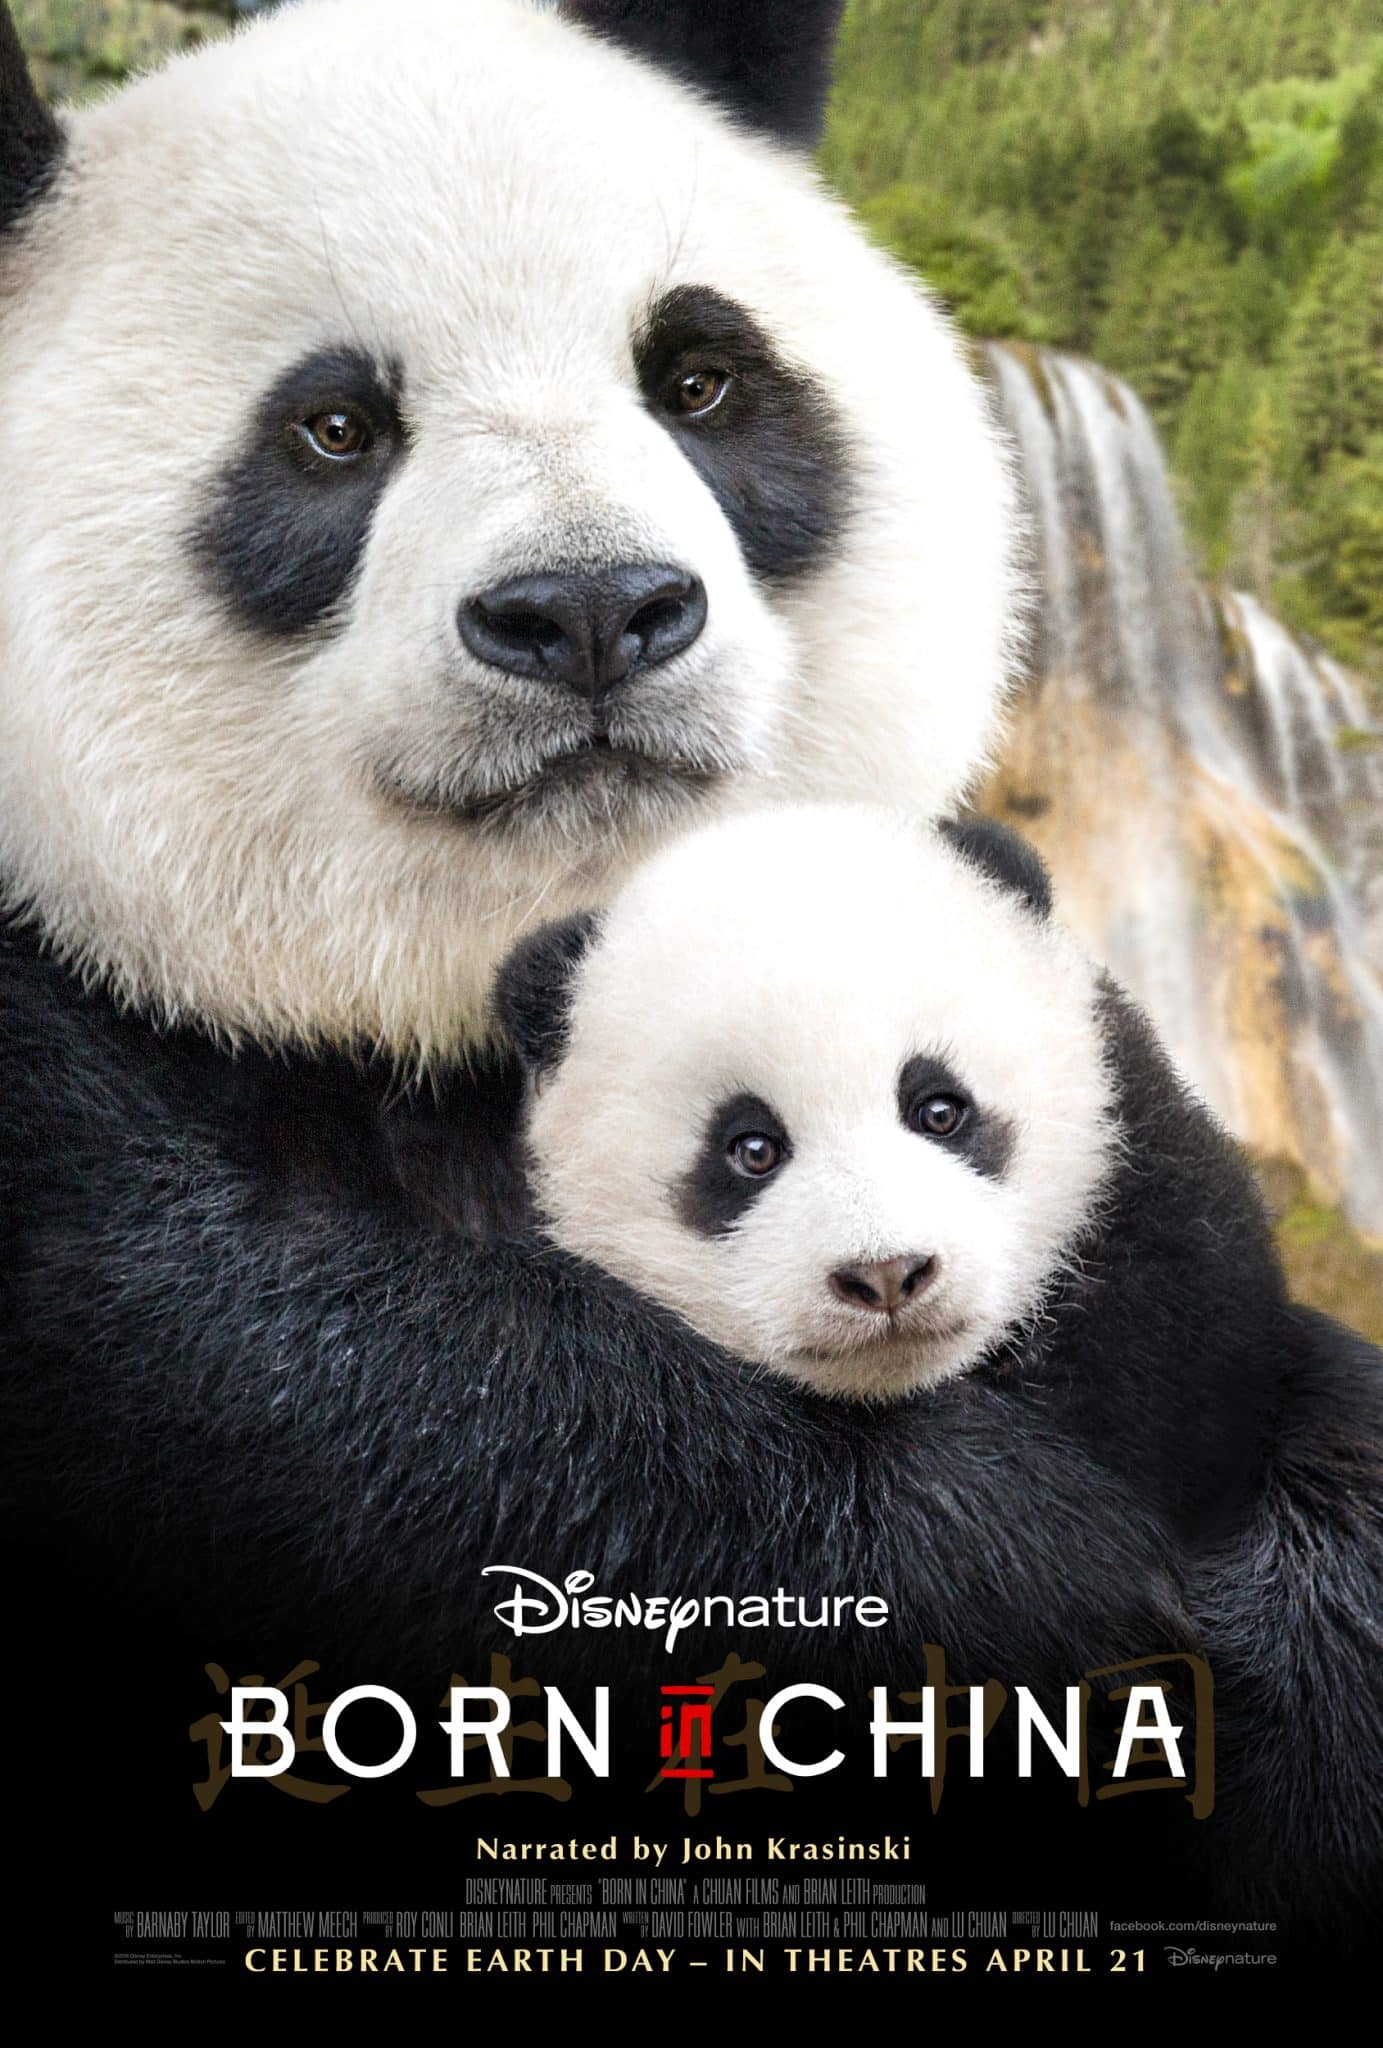 Born In China in Theaters April 21st! #BornInChina